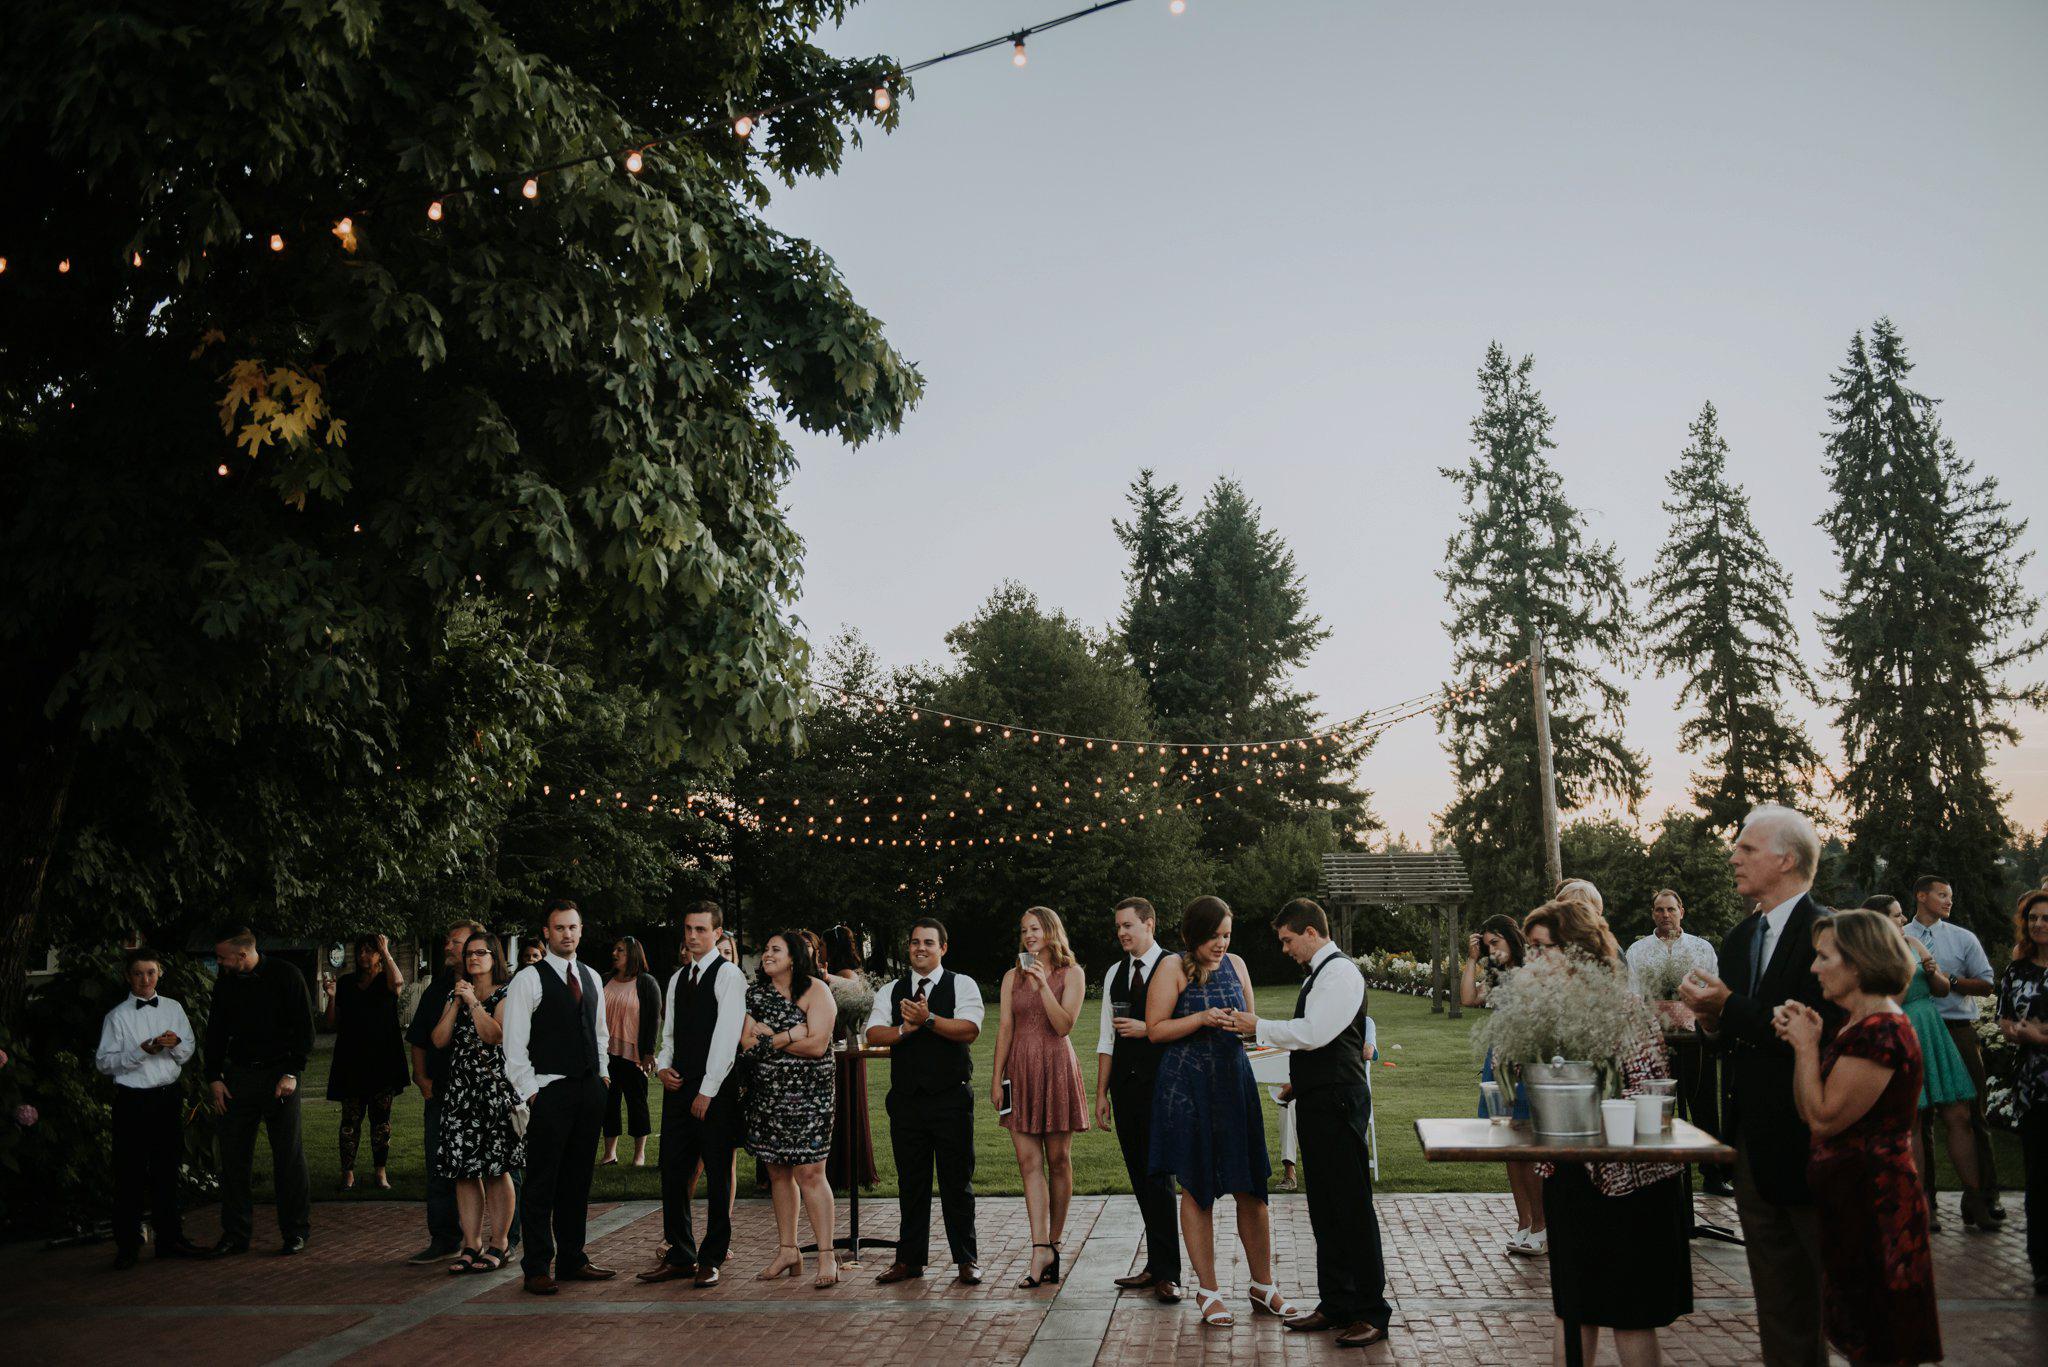 kristen-and-cody-the-kelley-farm-wedding-seattle-photographer-caitlyn-nikula-111.jpg